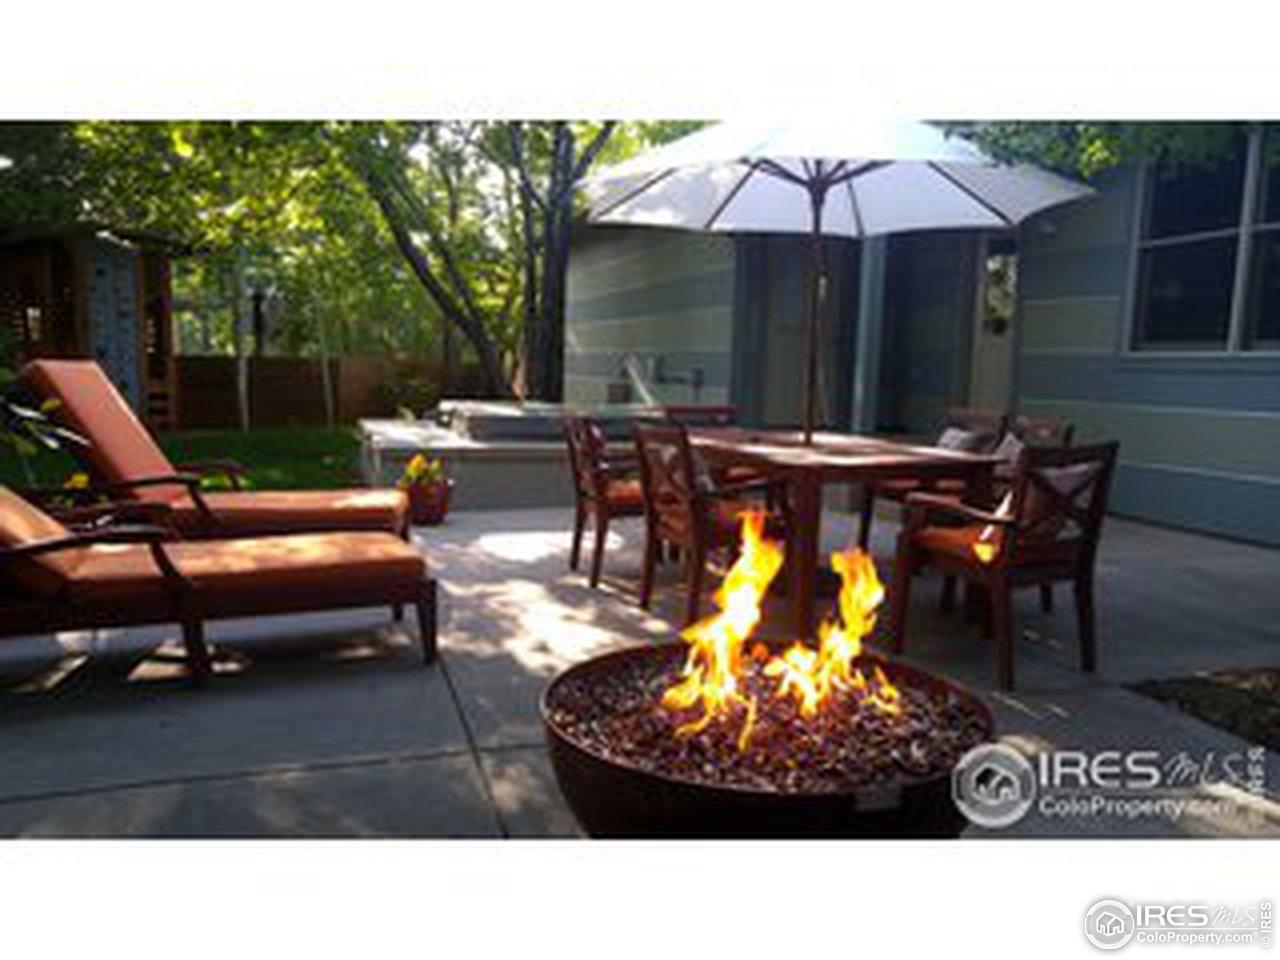 Elegant outdoor entertaining space